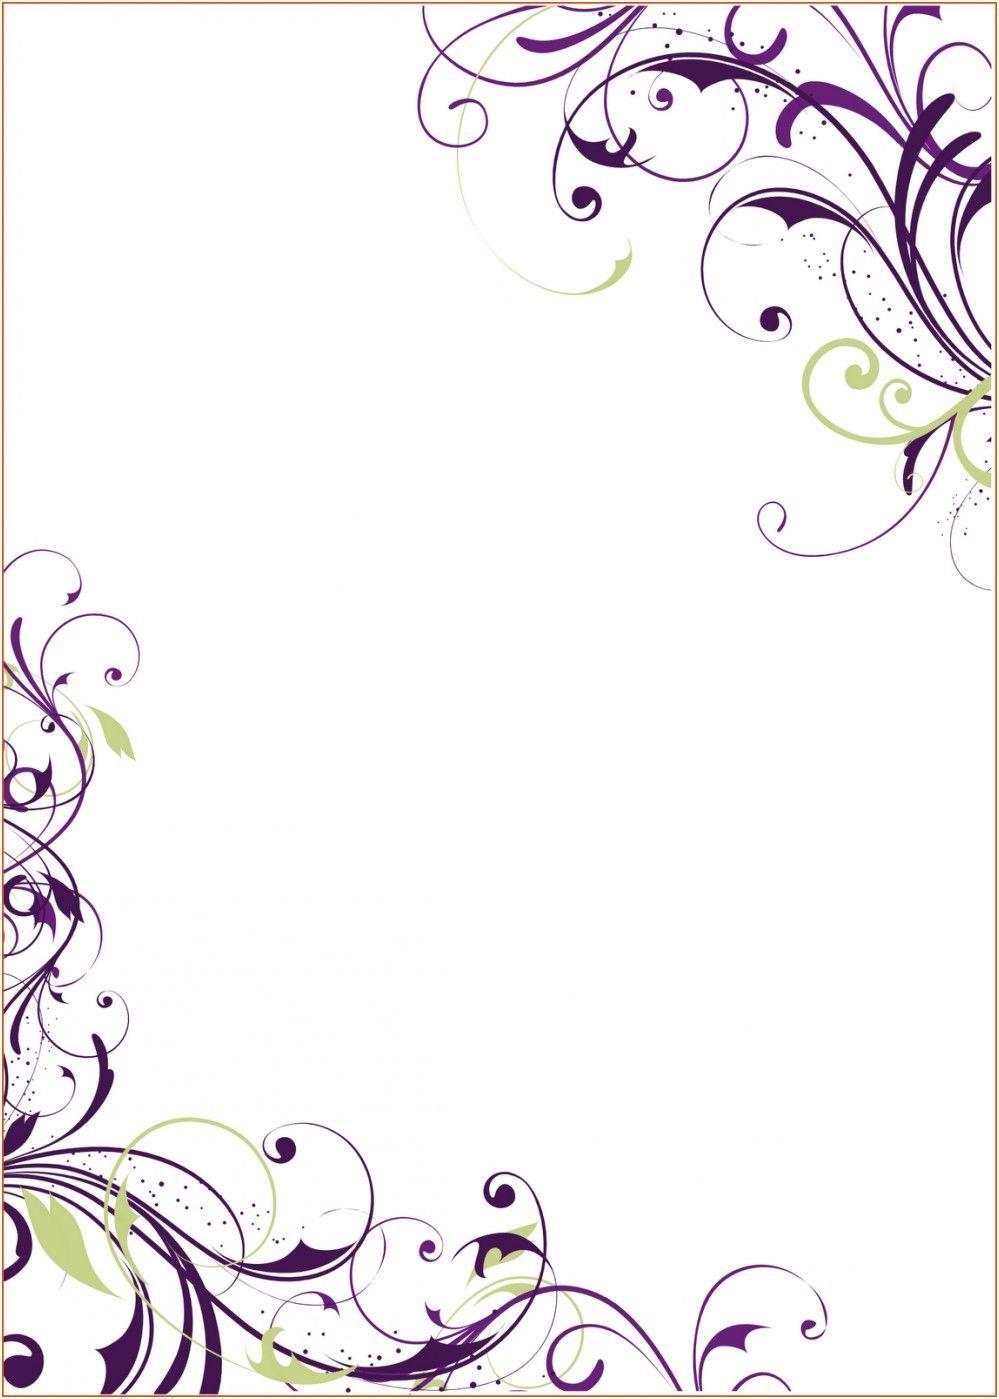 50th Wedding Anniversary Invitation Cards Blank Wedding Invitation Templates Wedding Invitation Card Design Wedding Invitation Templates